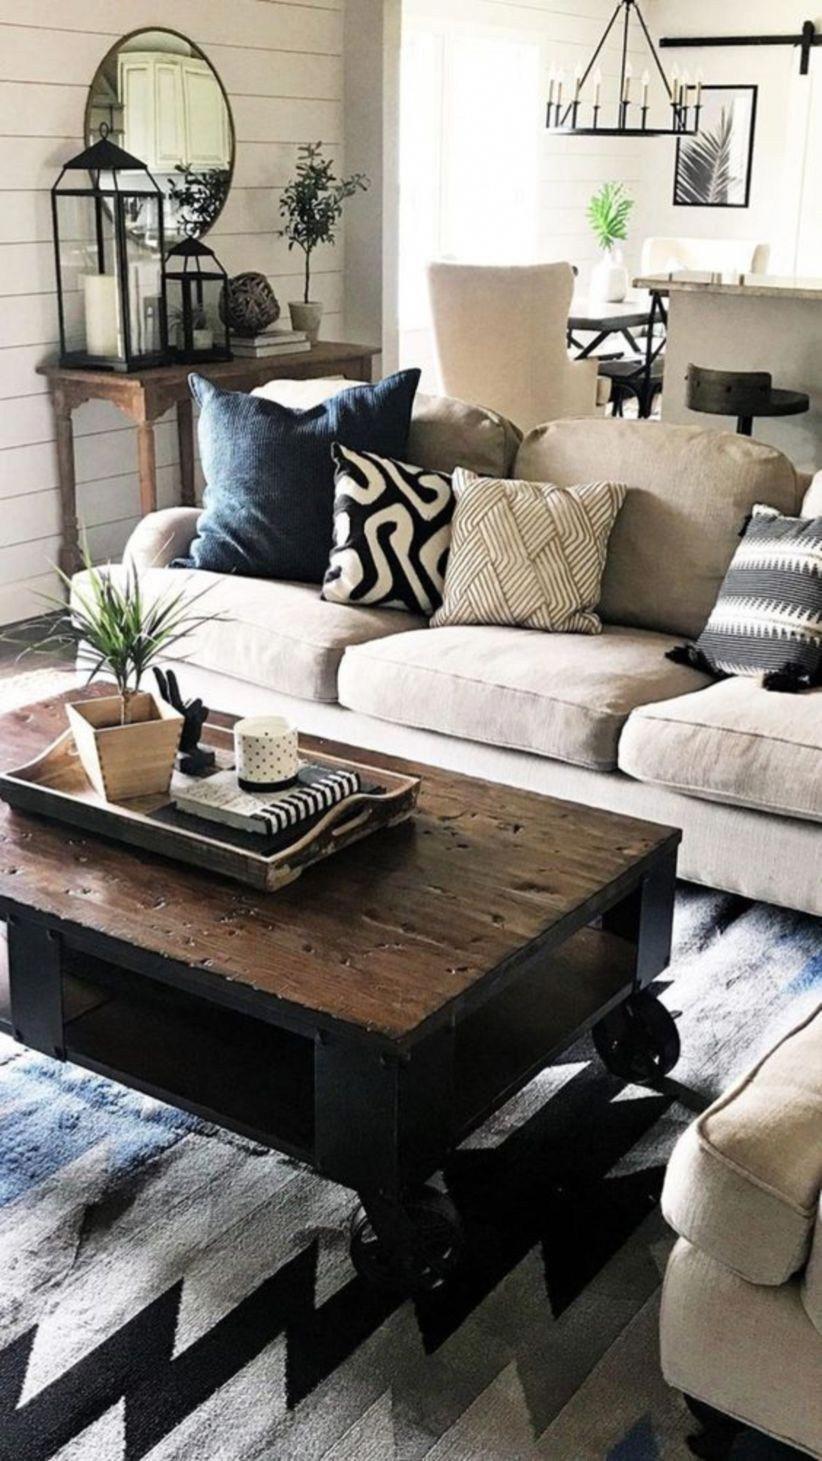 elegant farmhouse living room design and decor ideas 35 on modern farmhouse living room design and decor inspirations country farmhouse furniture id=36840